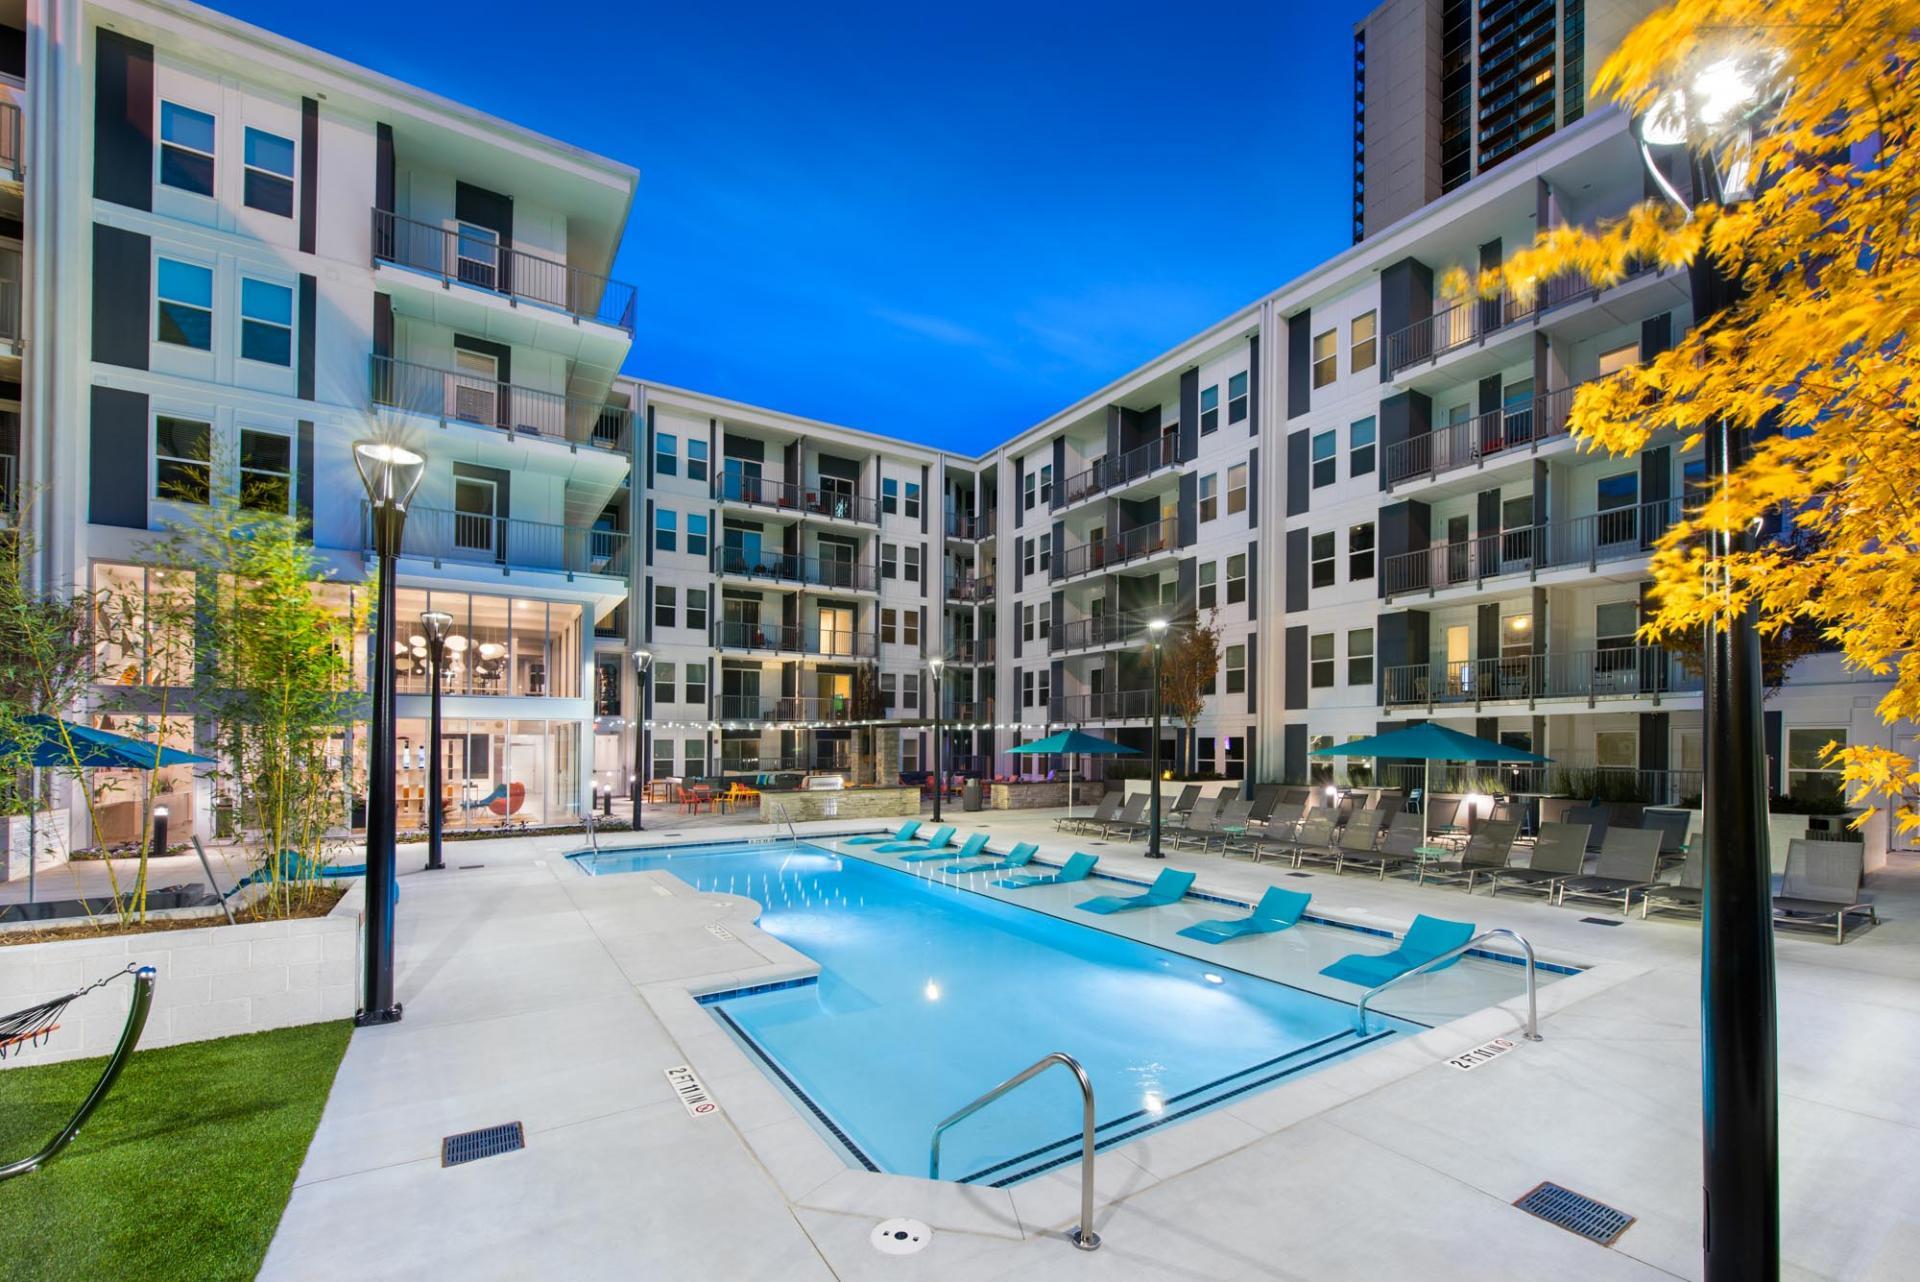 Pool at Spectrum on Spring Apartment